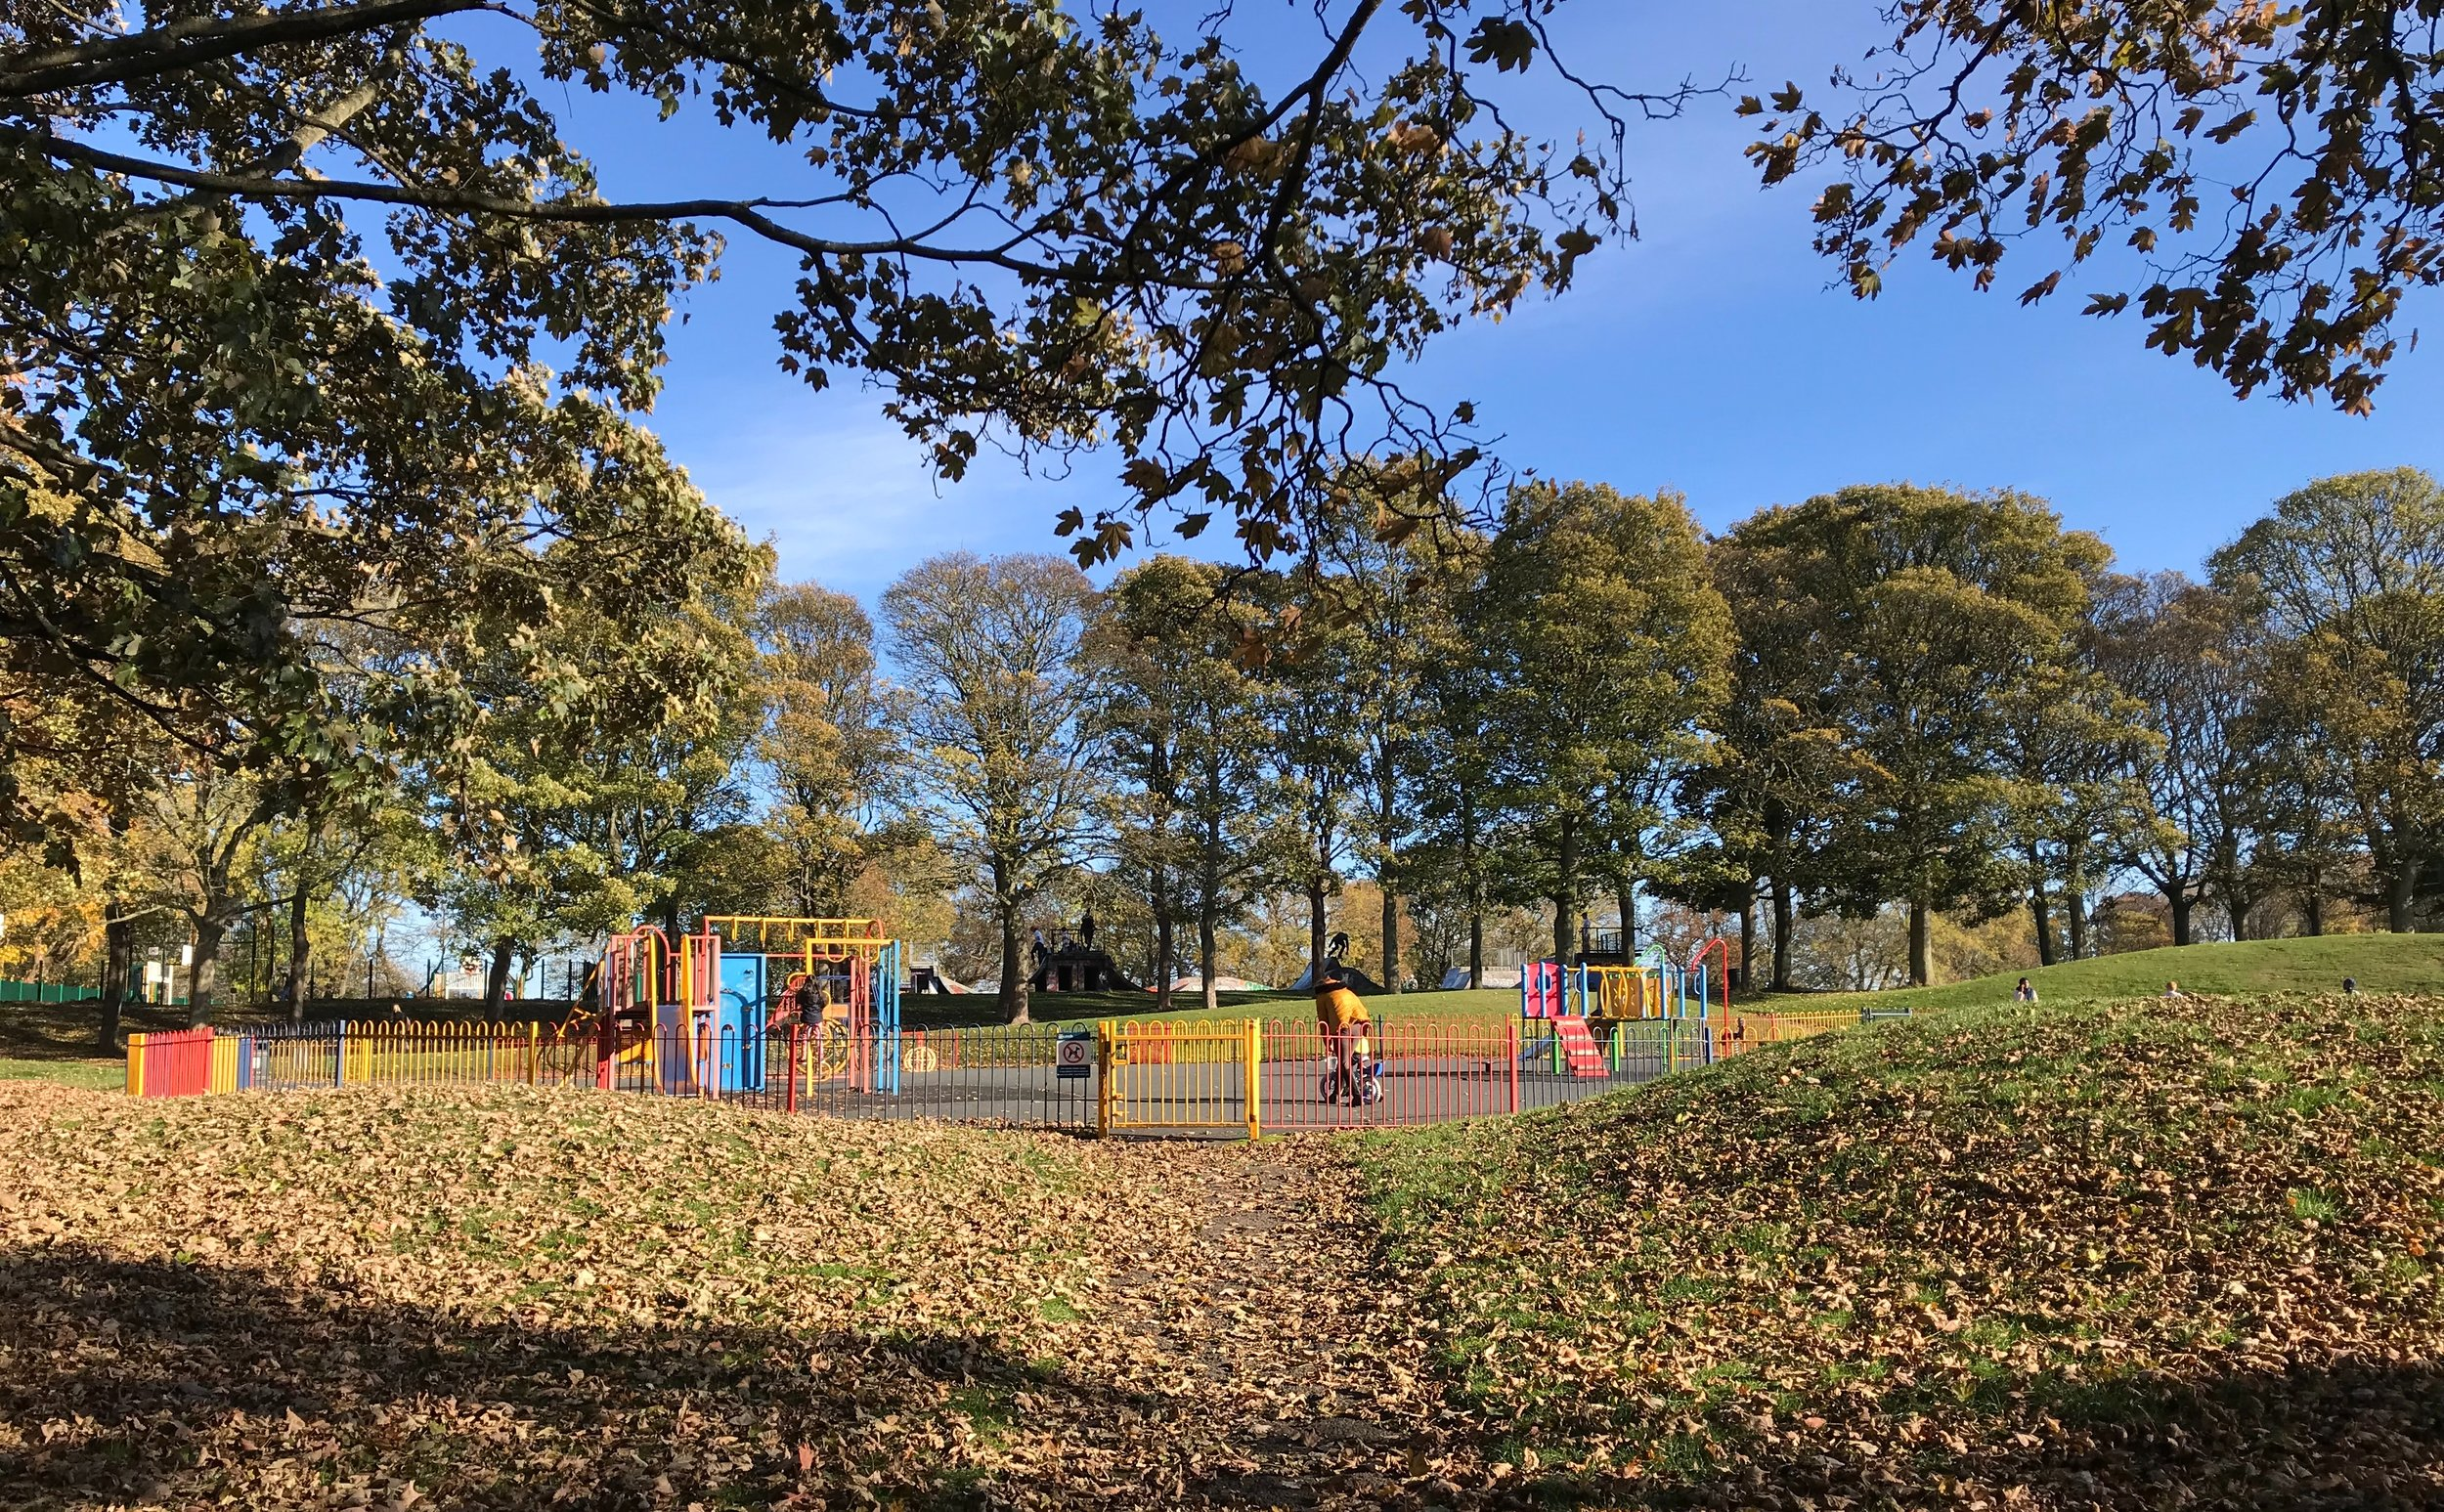 Playground, Woodhouse Moor © HP